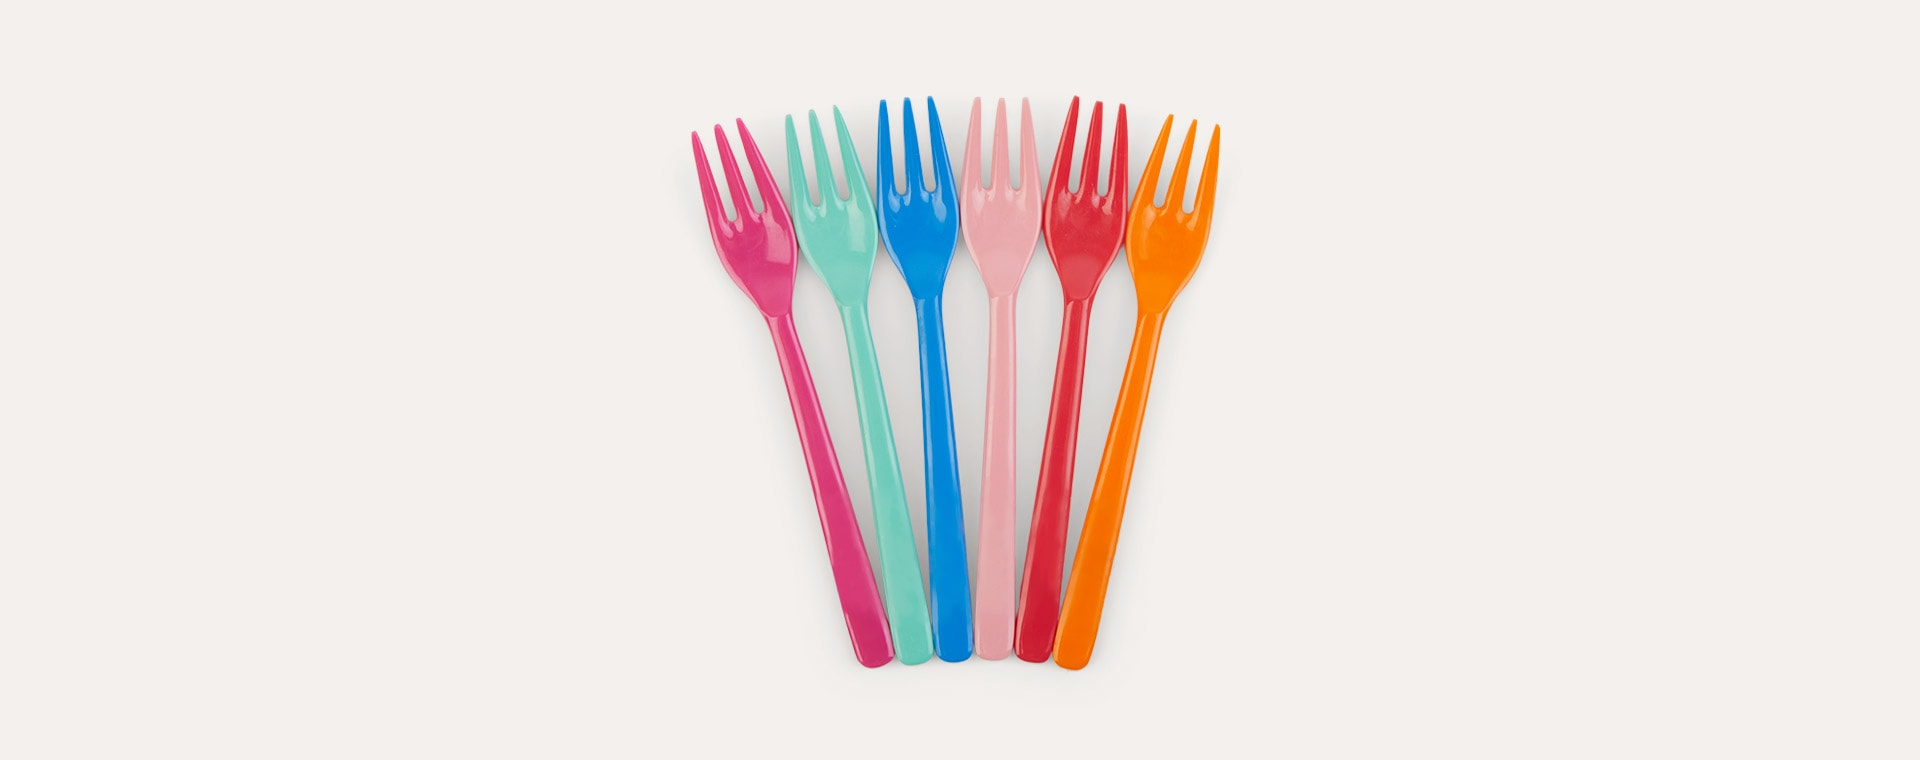 Choose Happy Forks Rice 6-Pack Melamine Cutlery